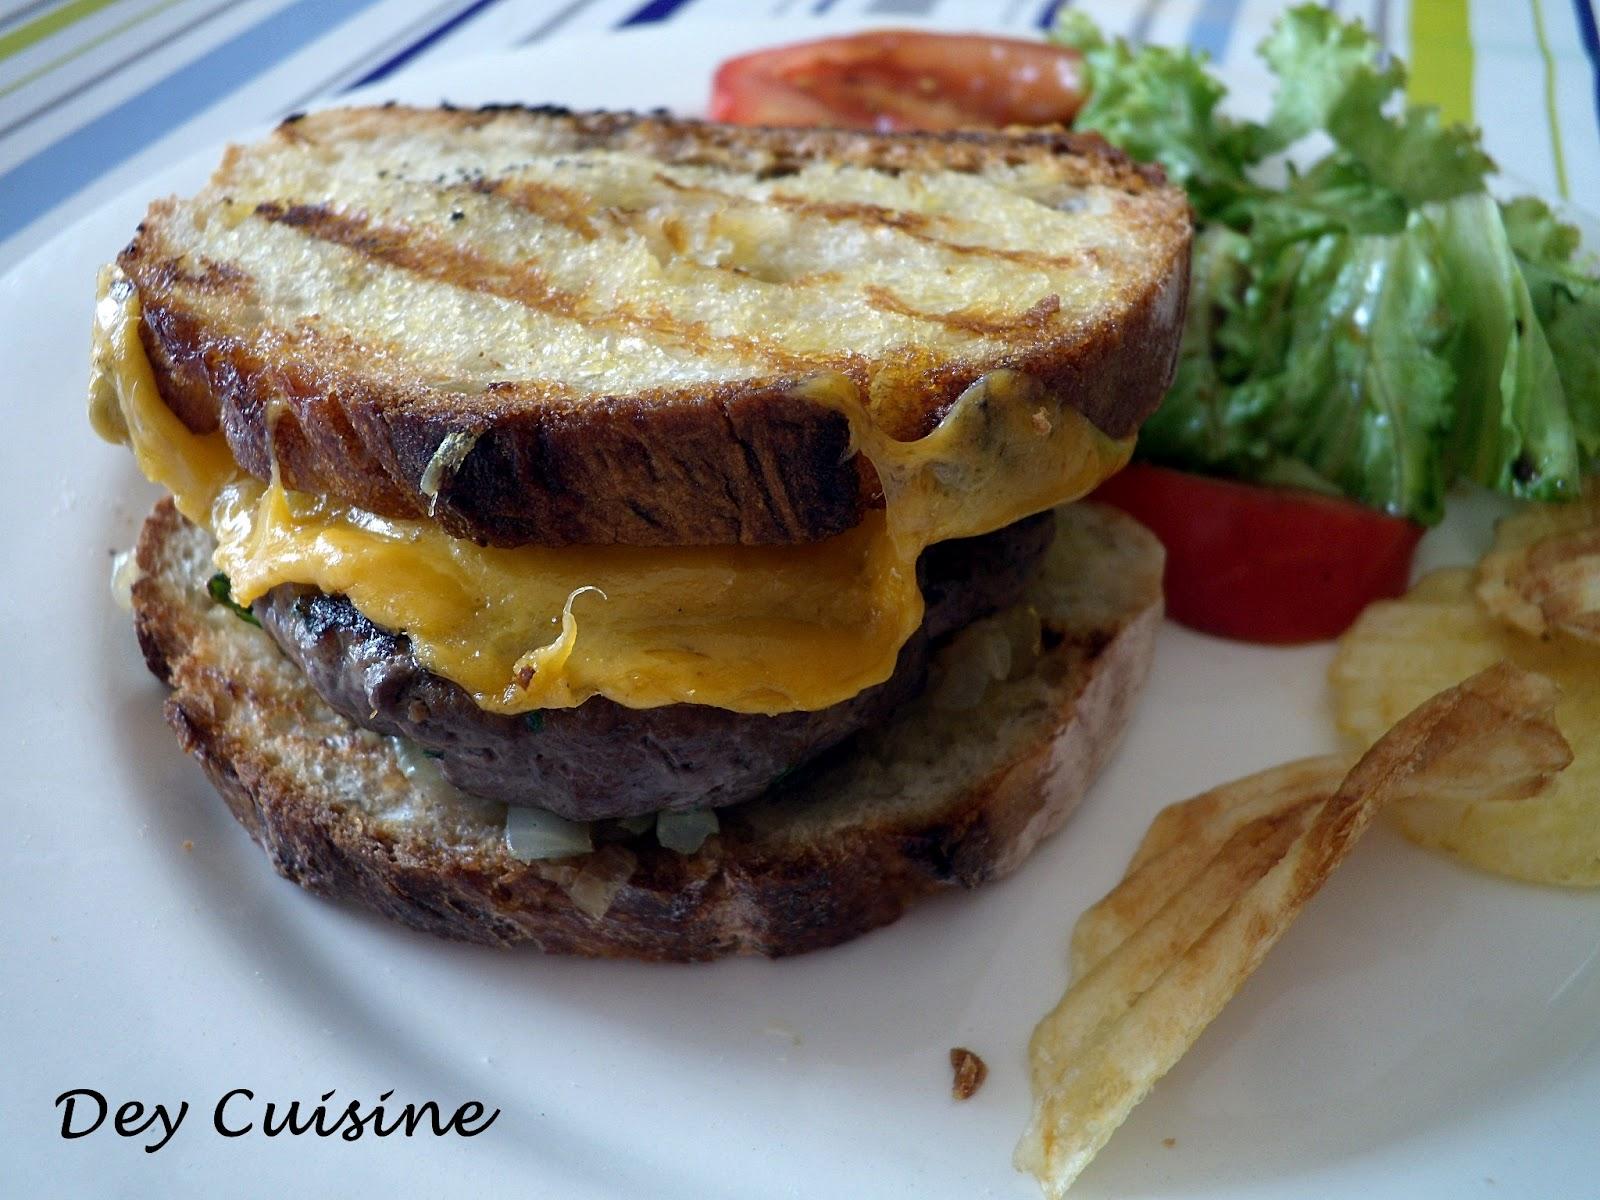 dey cuisine hamburgers sur pain toast au bbq. Black Bedroom Furniture Sets. Home Design Ideas